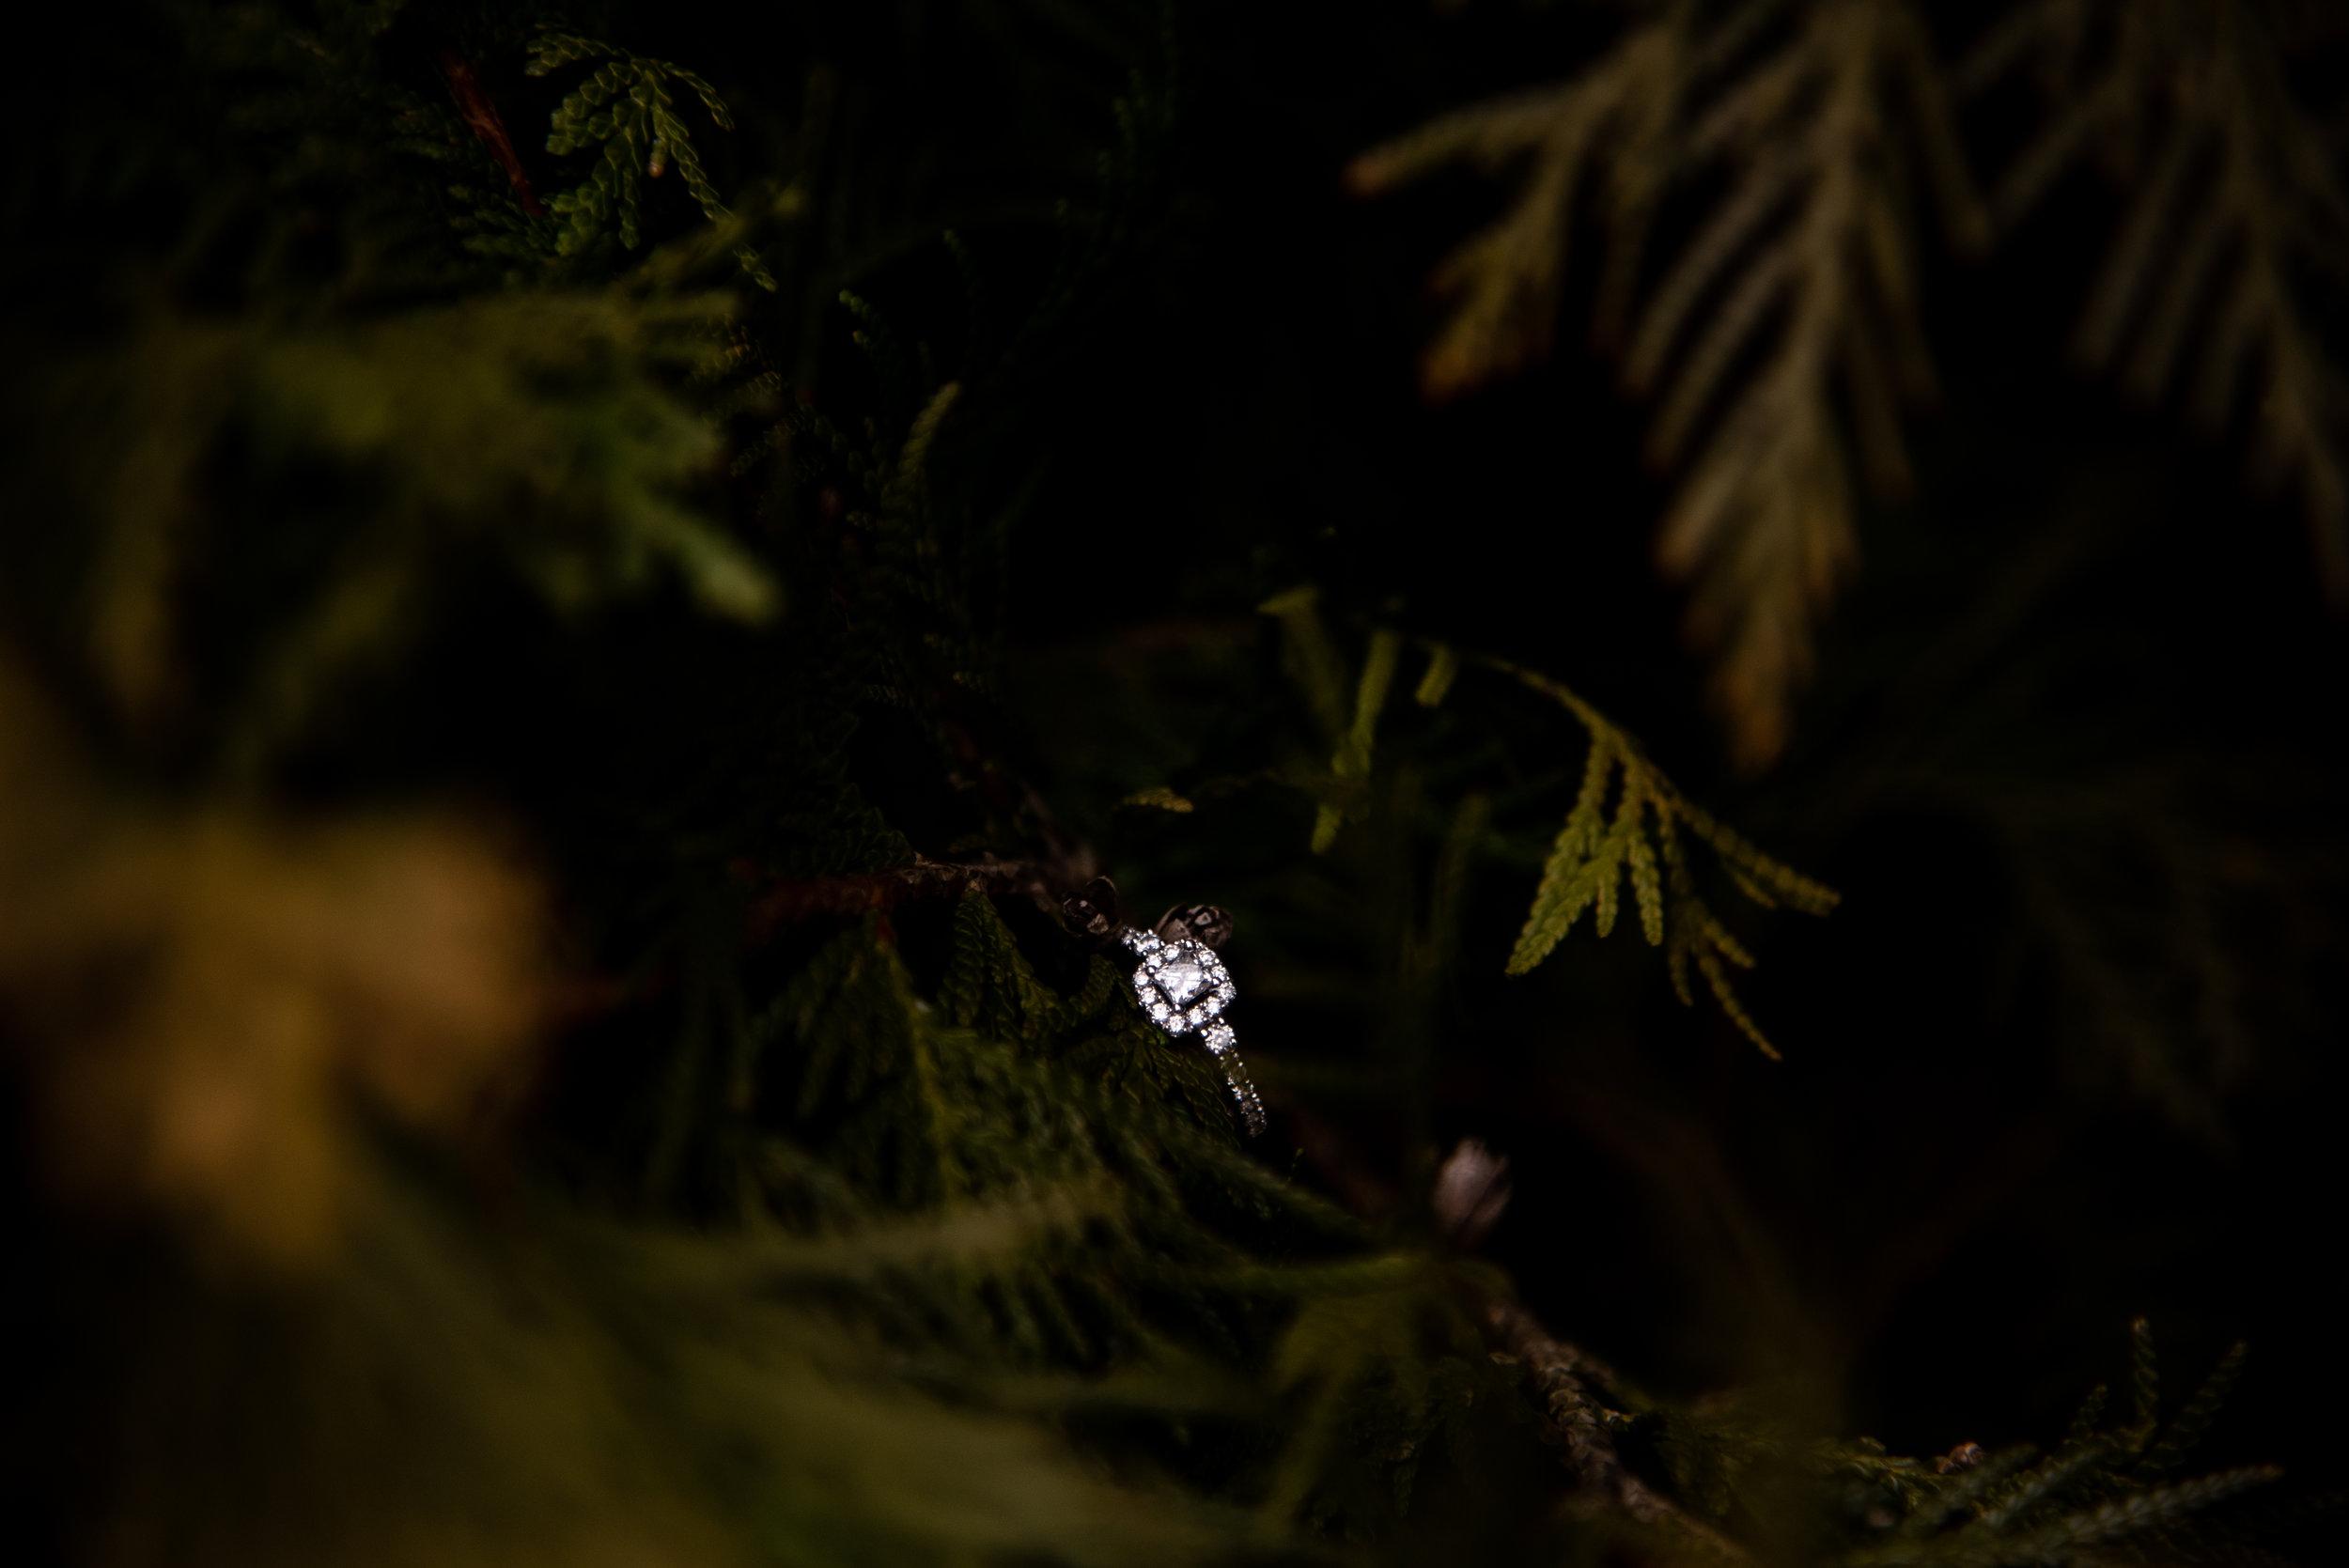 Kyla Jo Photography // Muncie, Indiana // Engagement Photos // Engagement Session // Muncie Indiana Photographer // Midwest Photographer // Whitetail Tree Farm // Couple Photos // Ring Photos